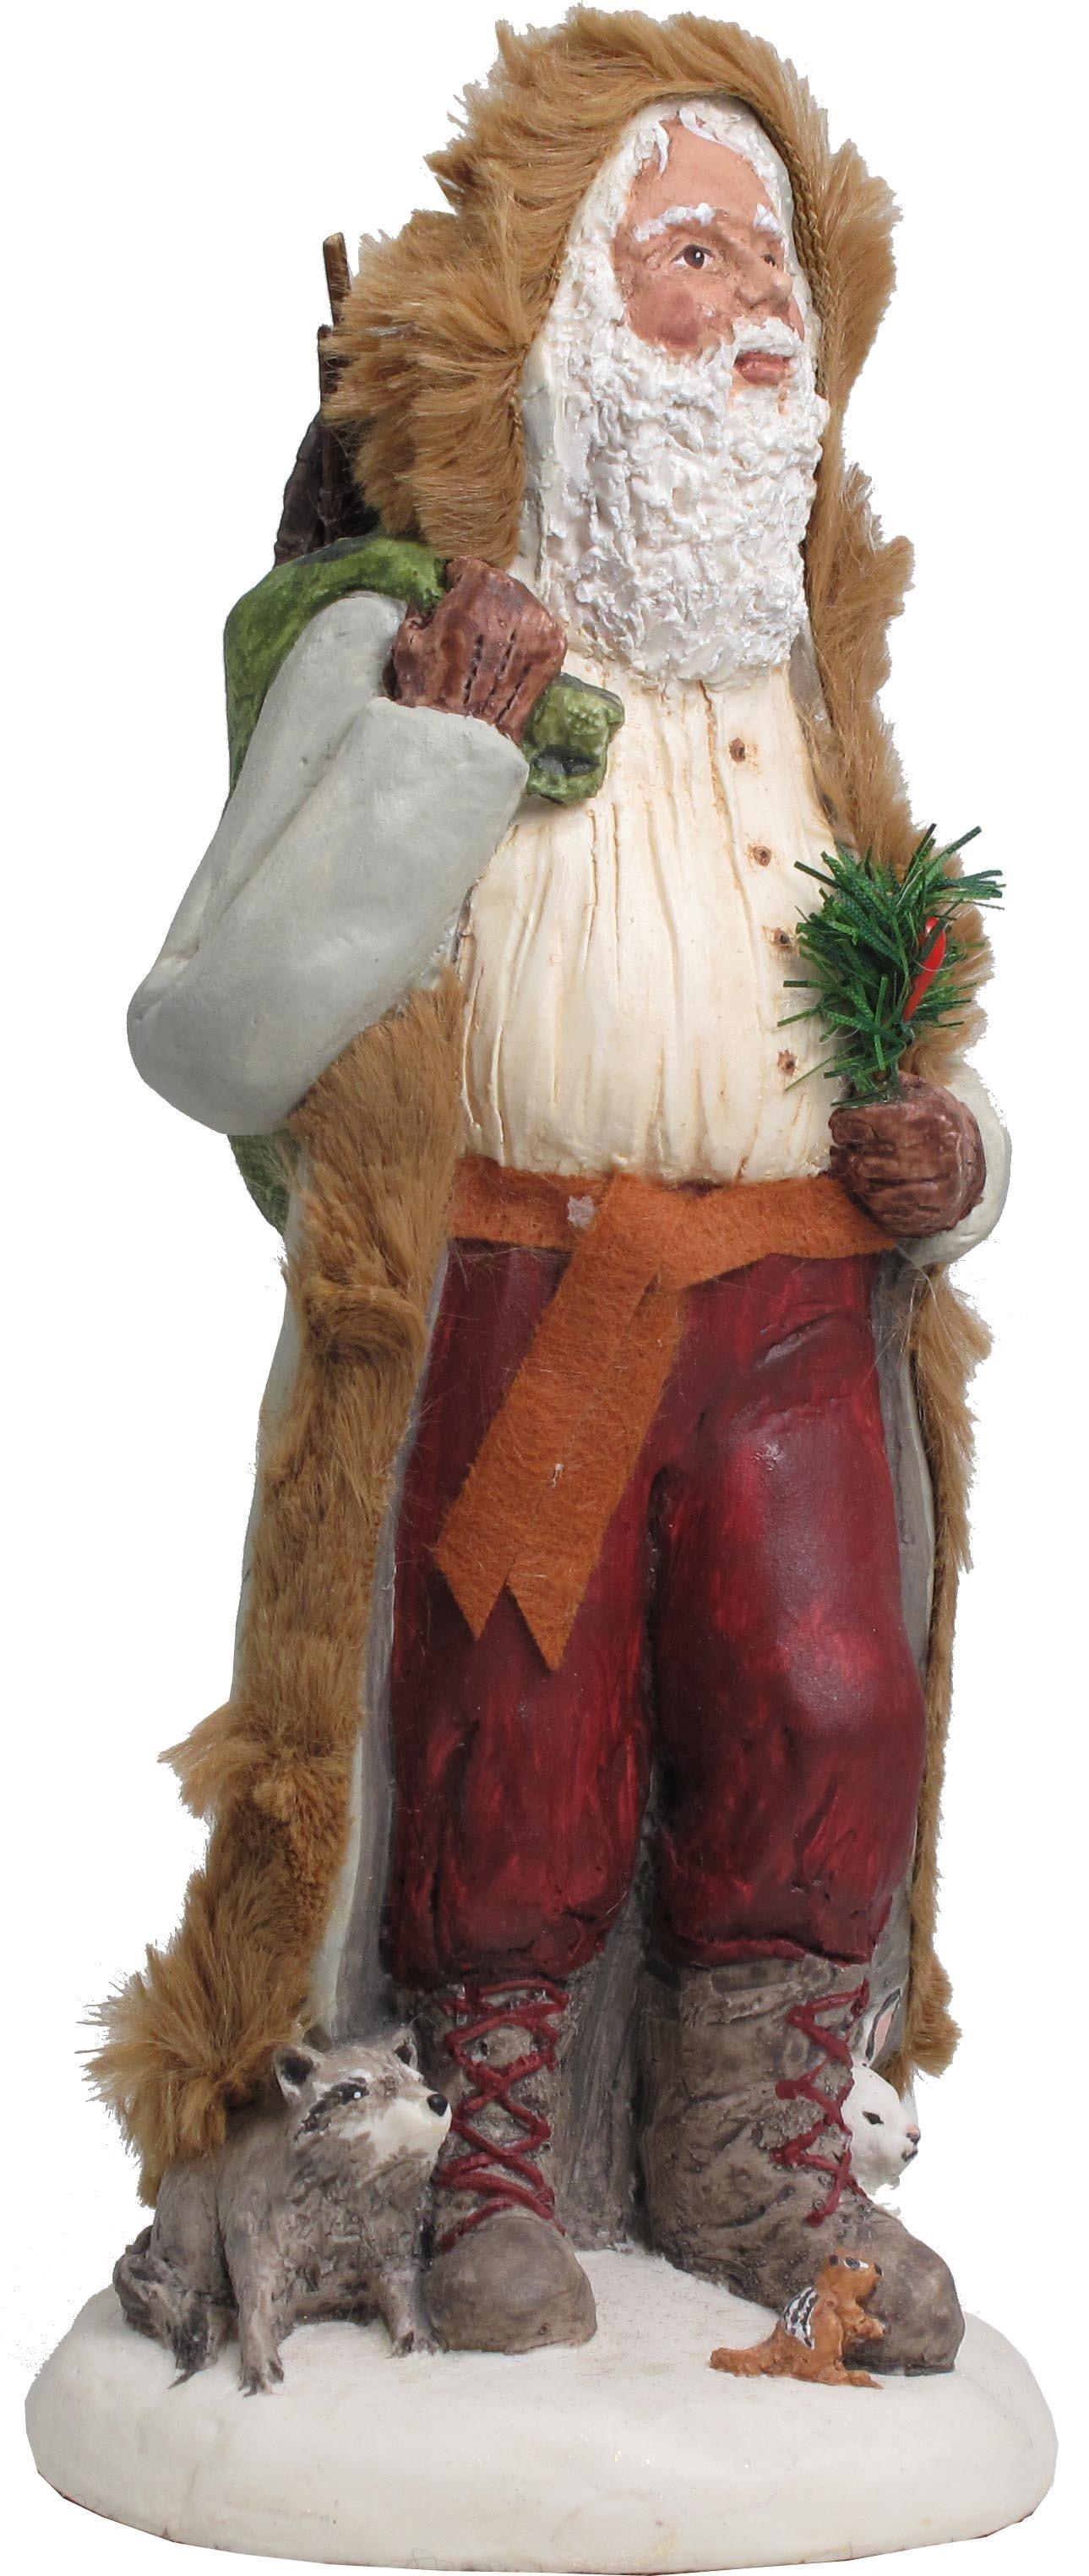 Northwoods Santa